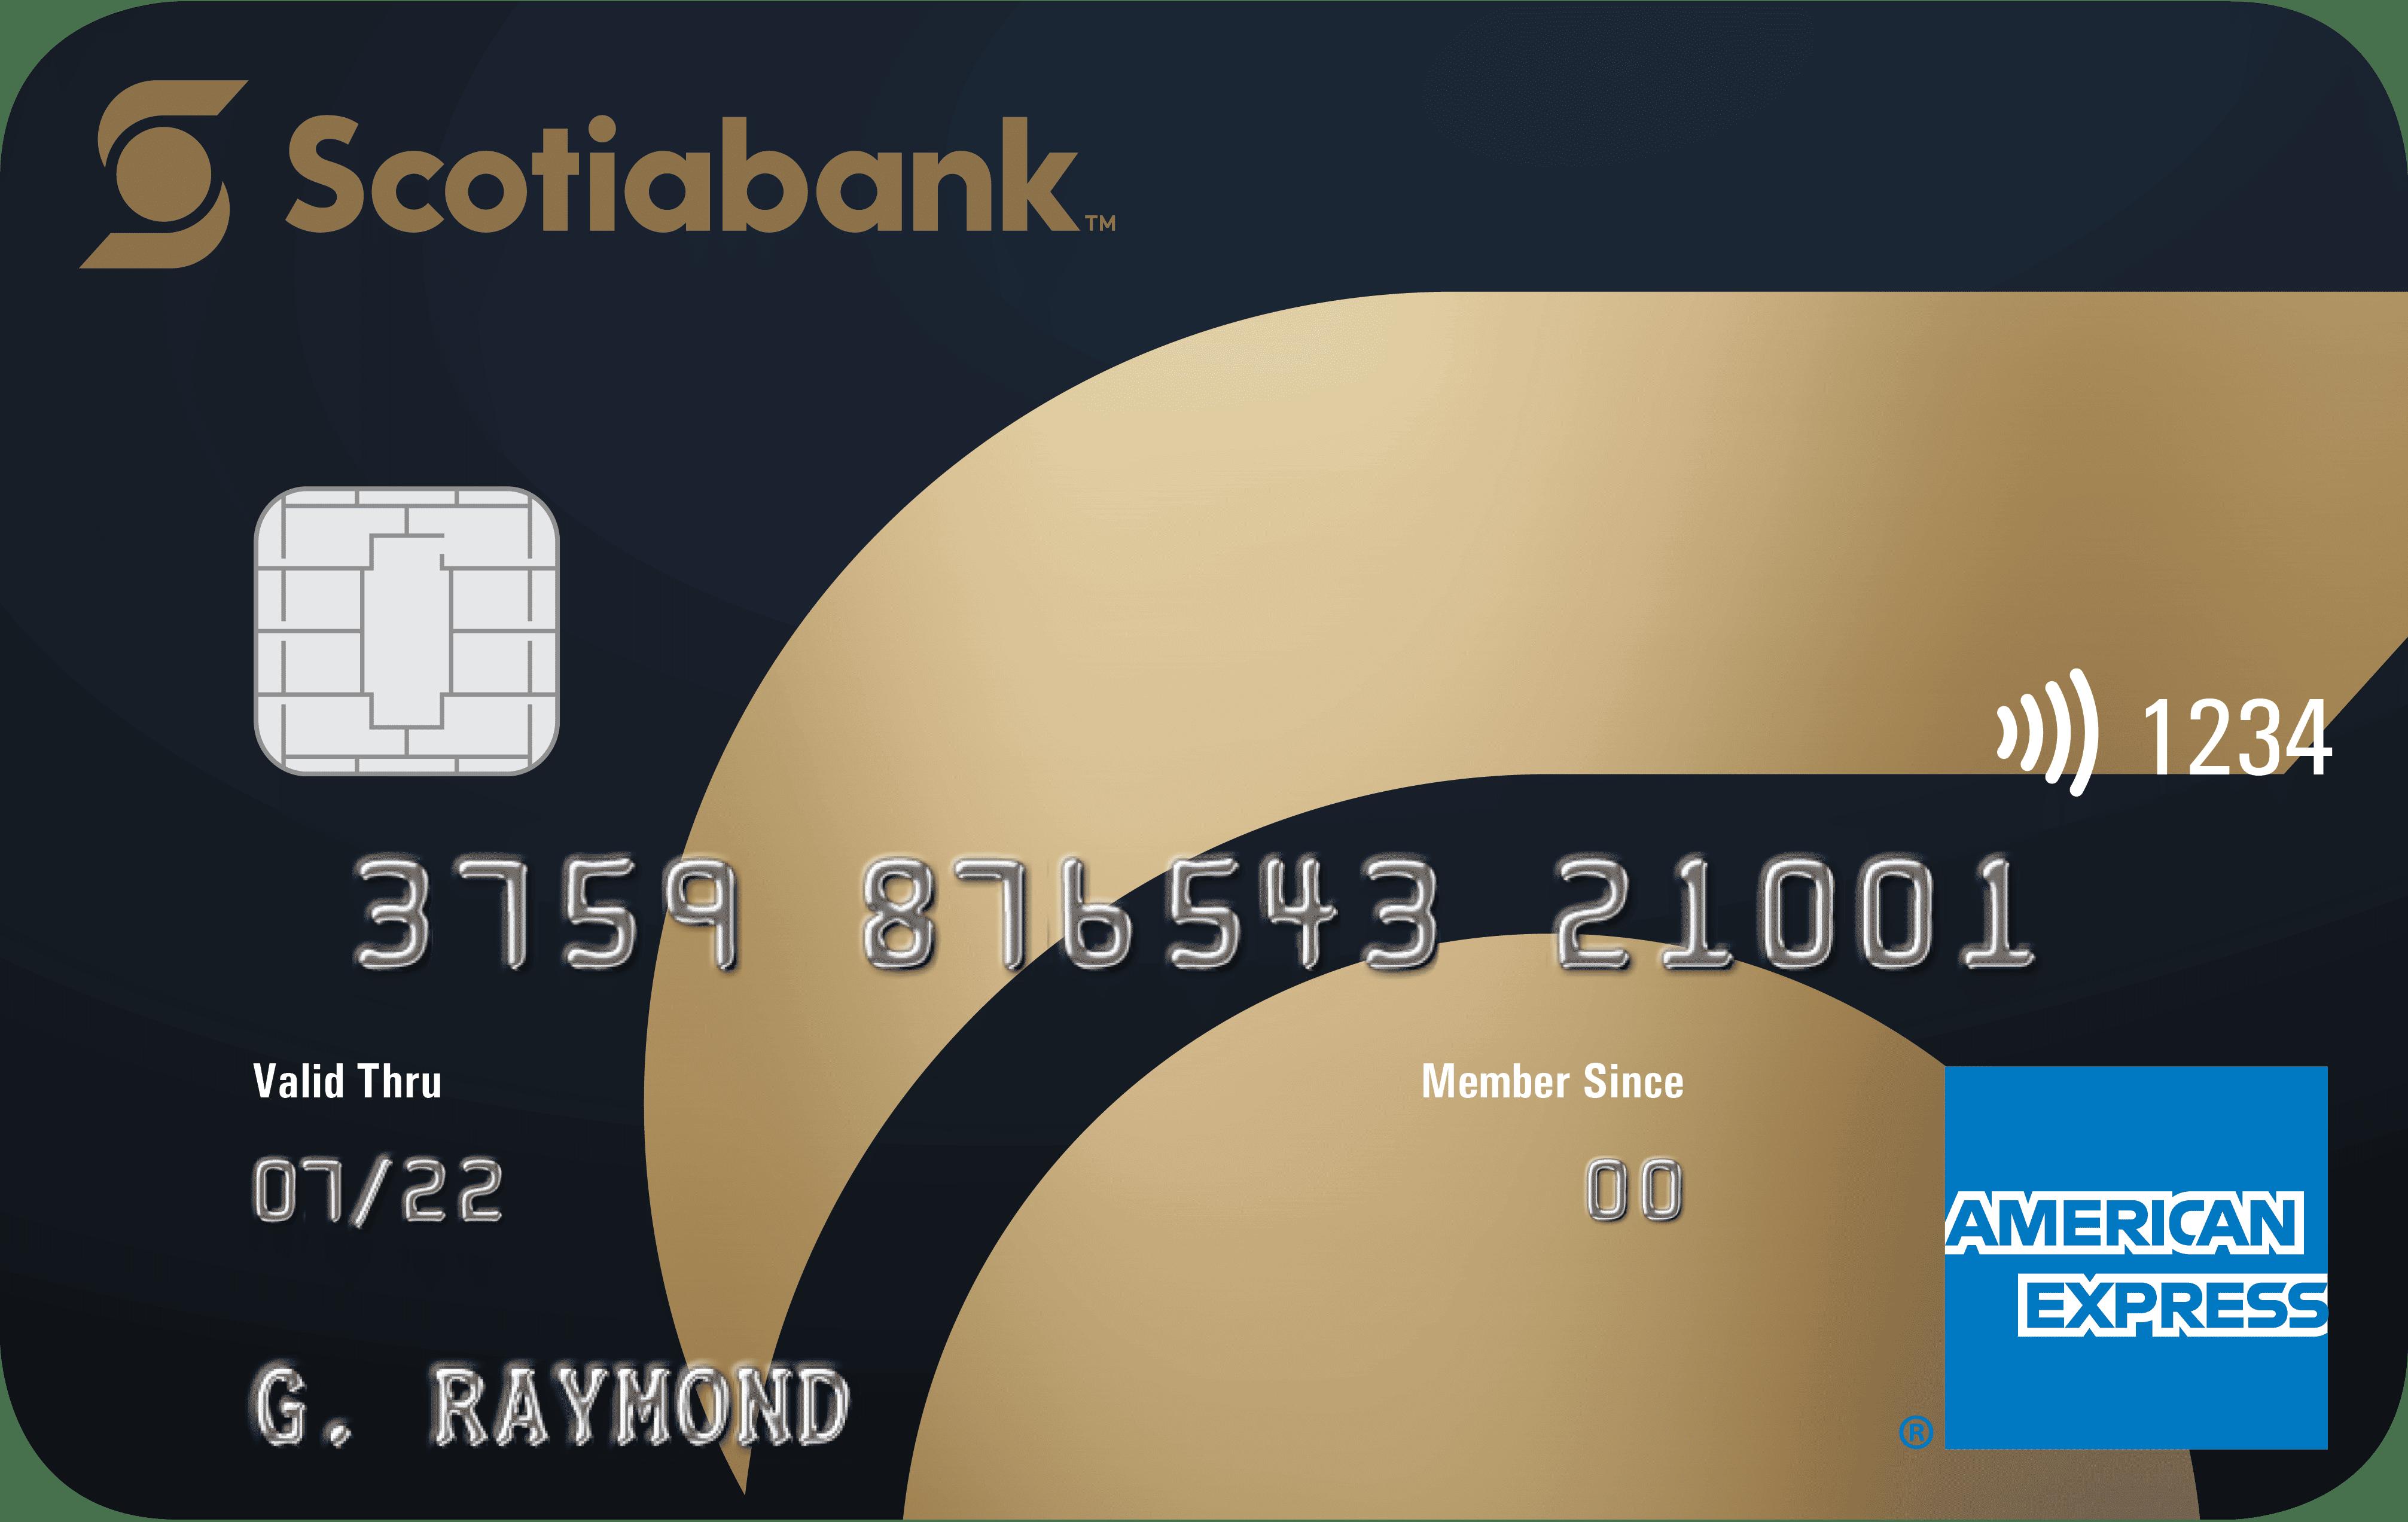 Scotiabank® Gold American Express® Card